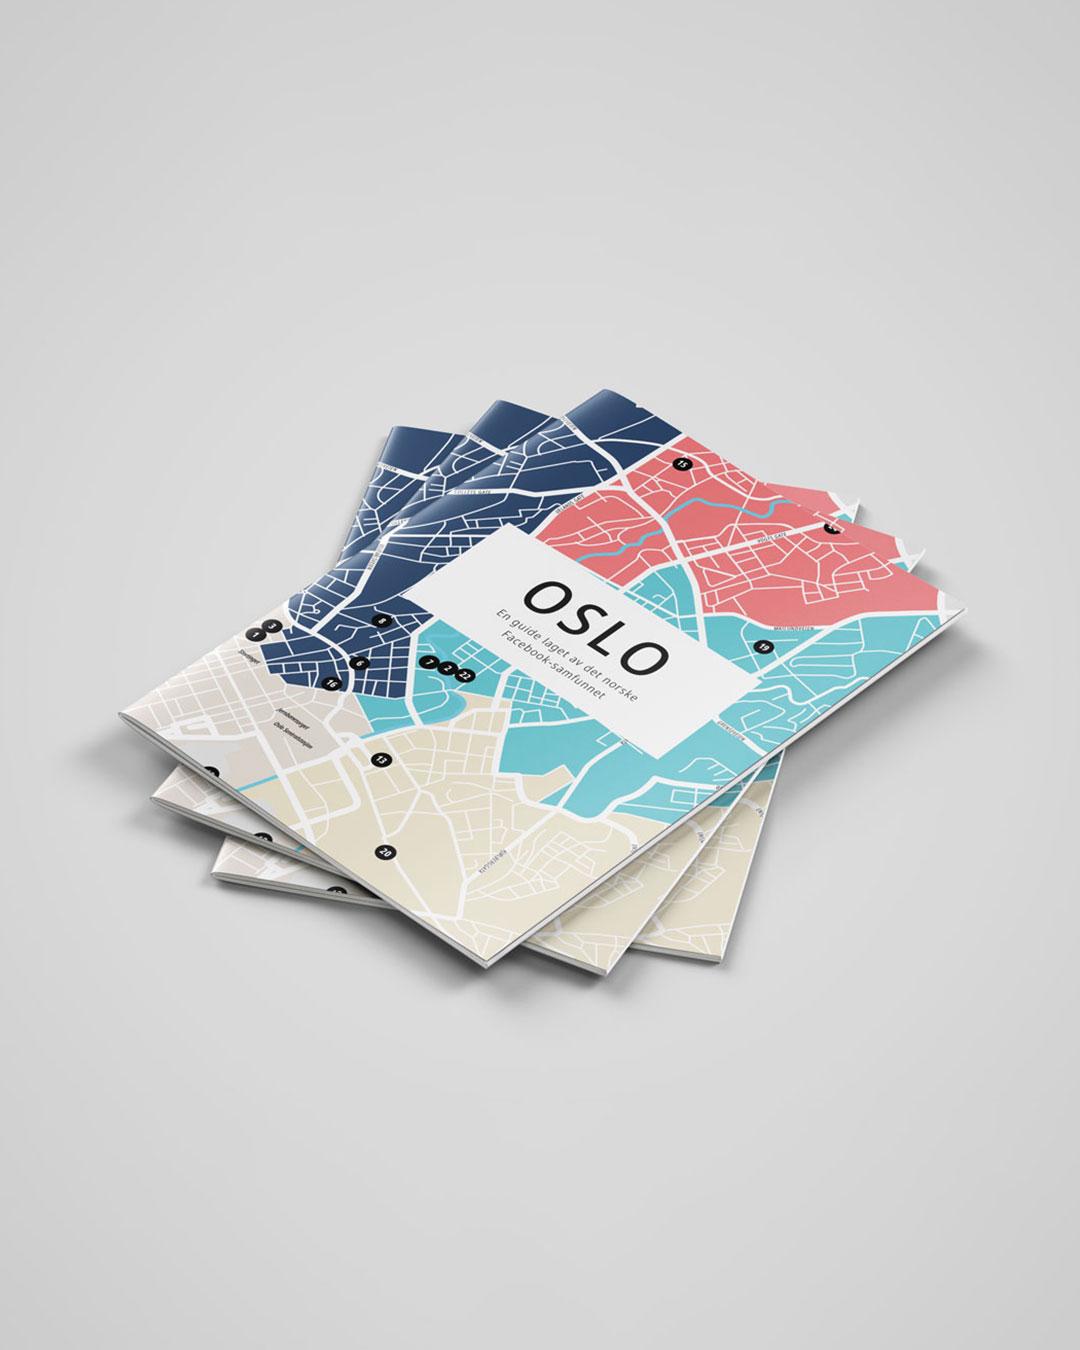 ohHello Design Project   Broshure - Facebook Community City Guide